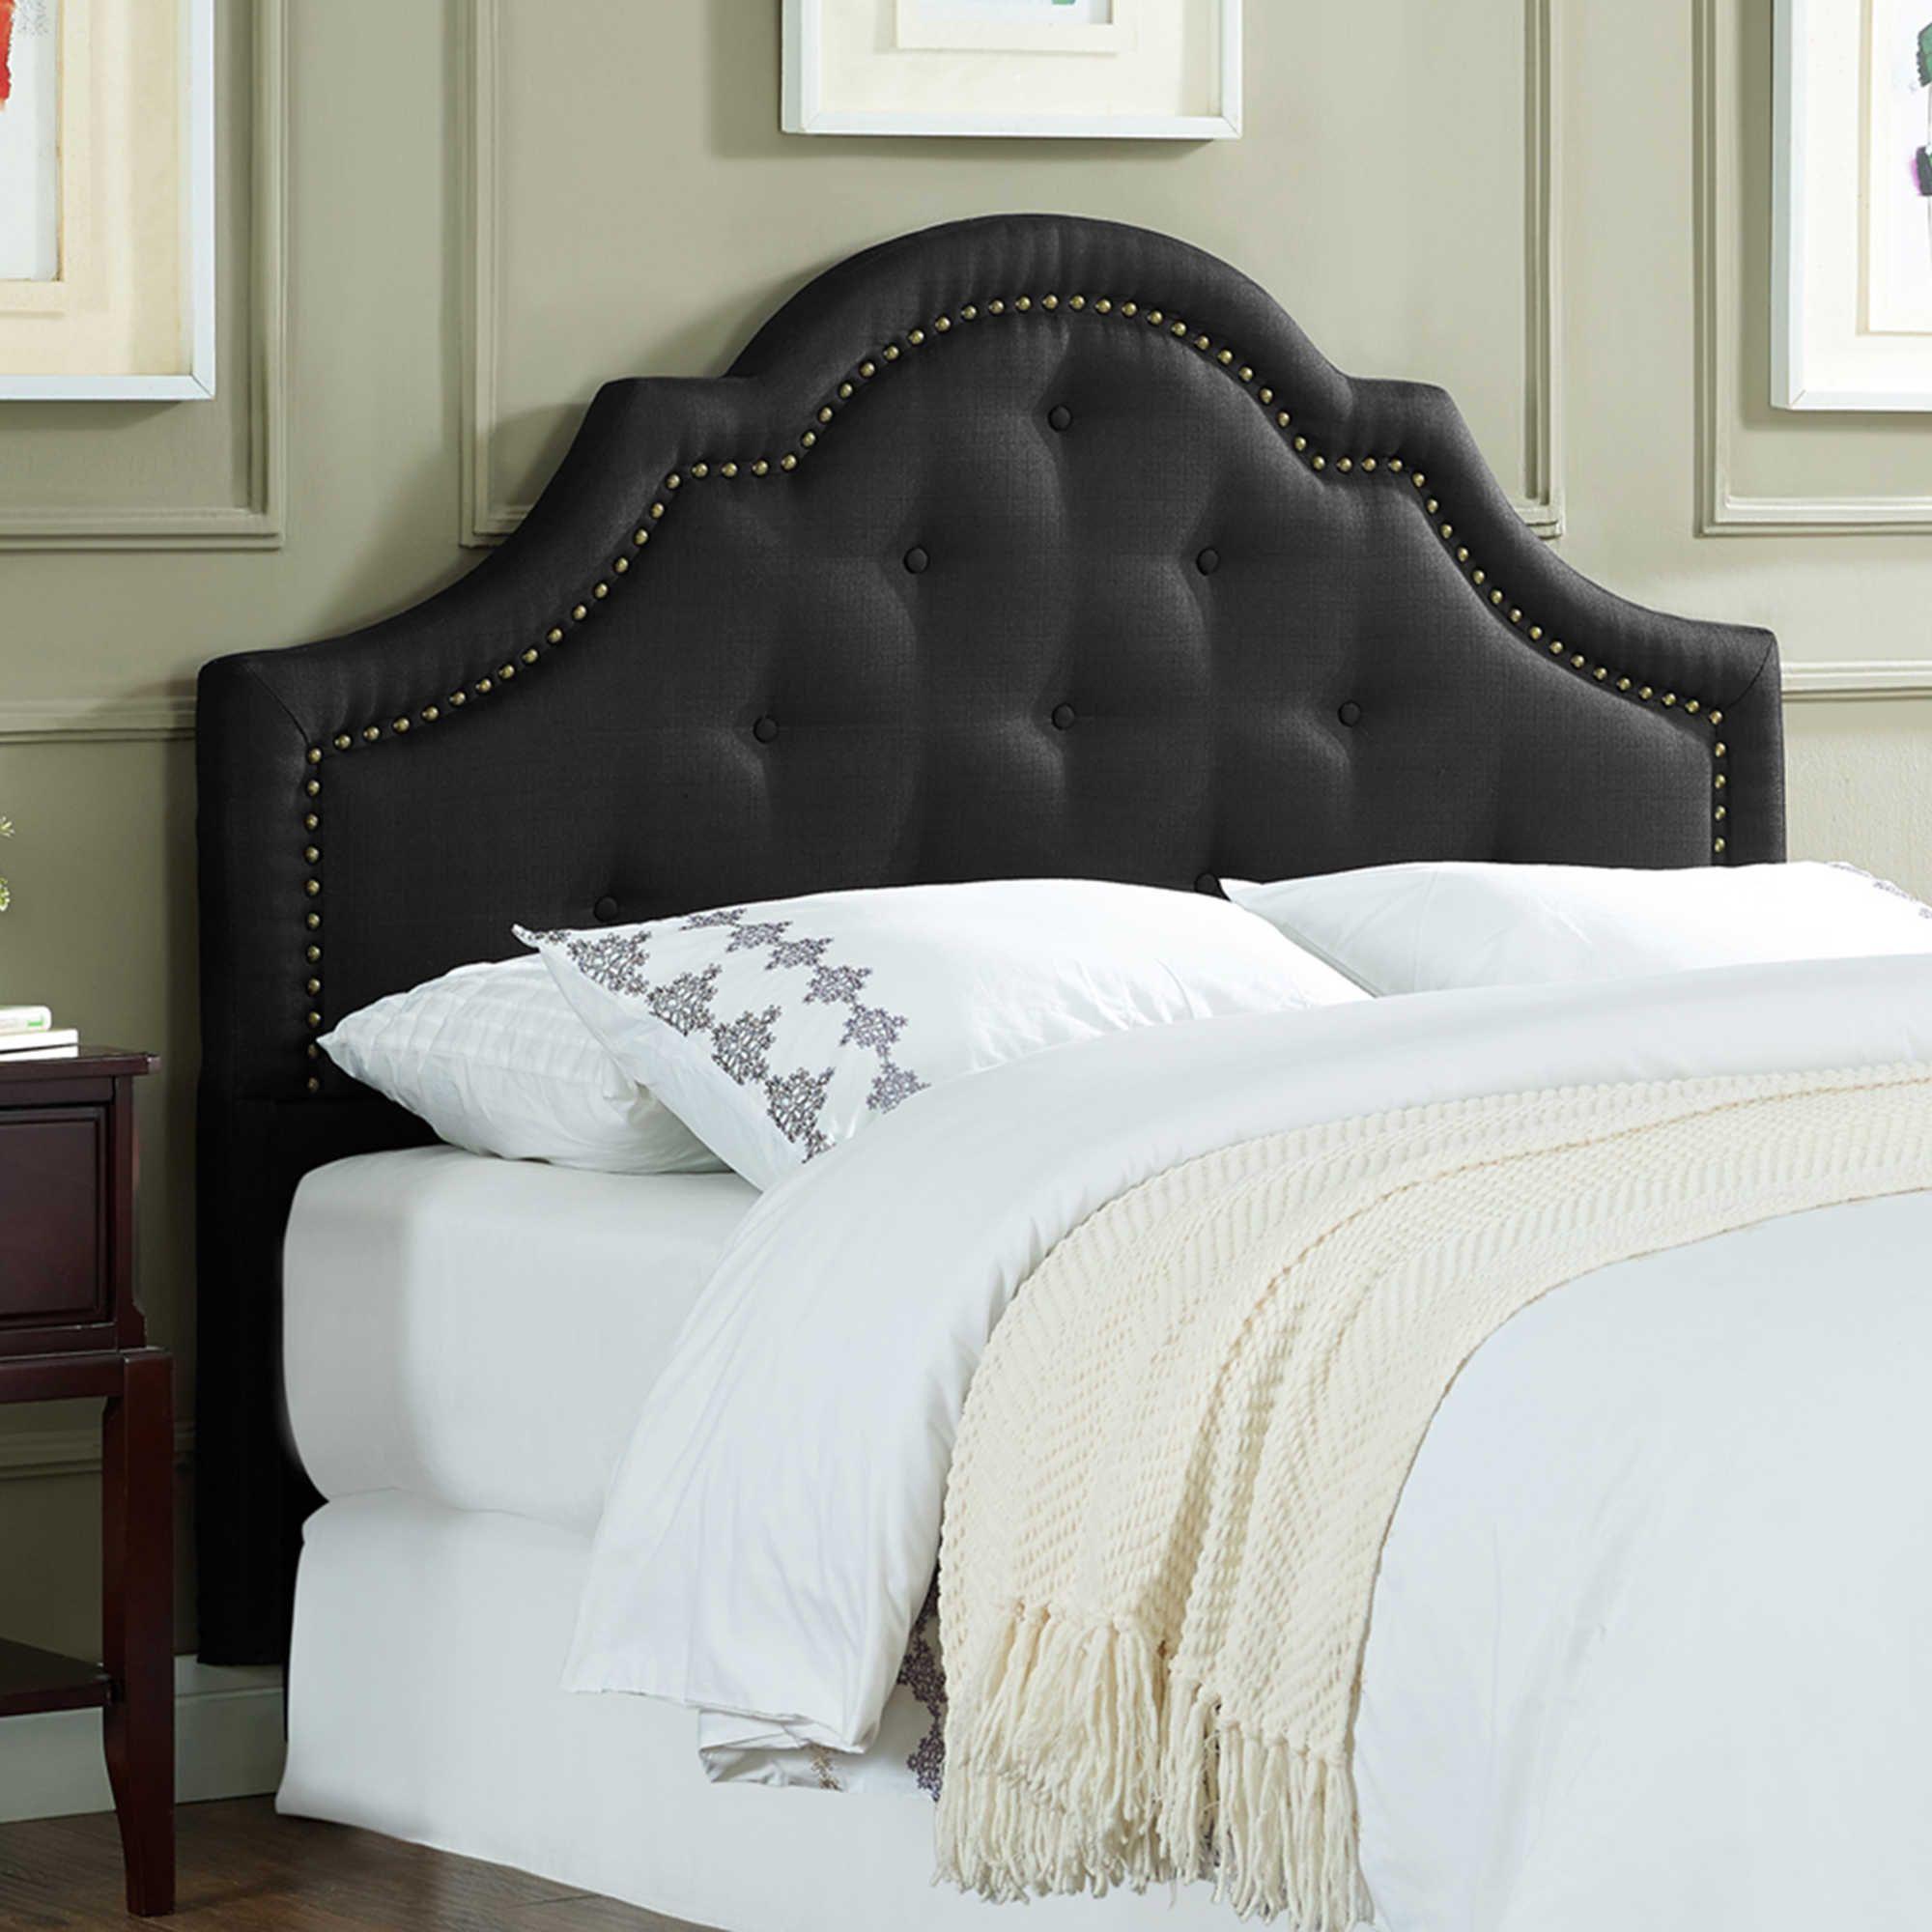 Lifestyles Solutions Felicity King Headboard In Black Headboard Upholstered Headboard Upholstered Panels